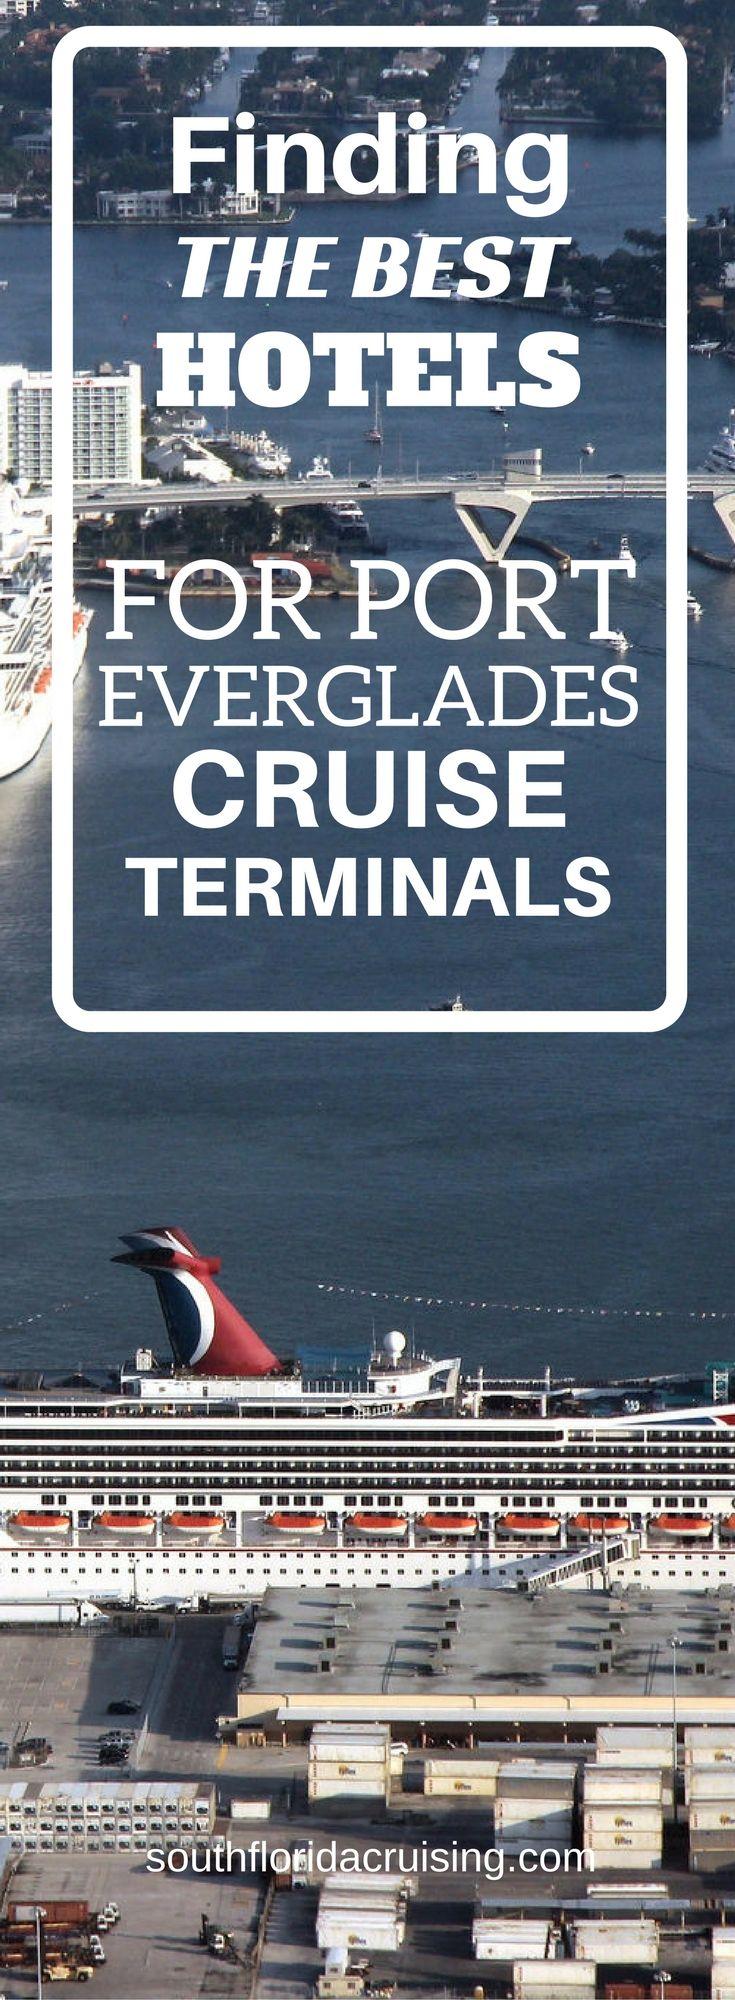 Best Cruise Tips Images On Pinterest Cruise Tips Cruise - Best cruises from florida